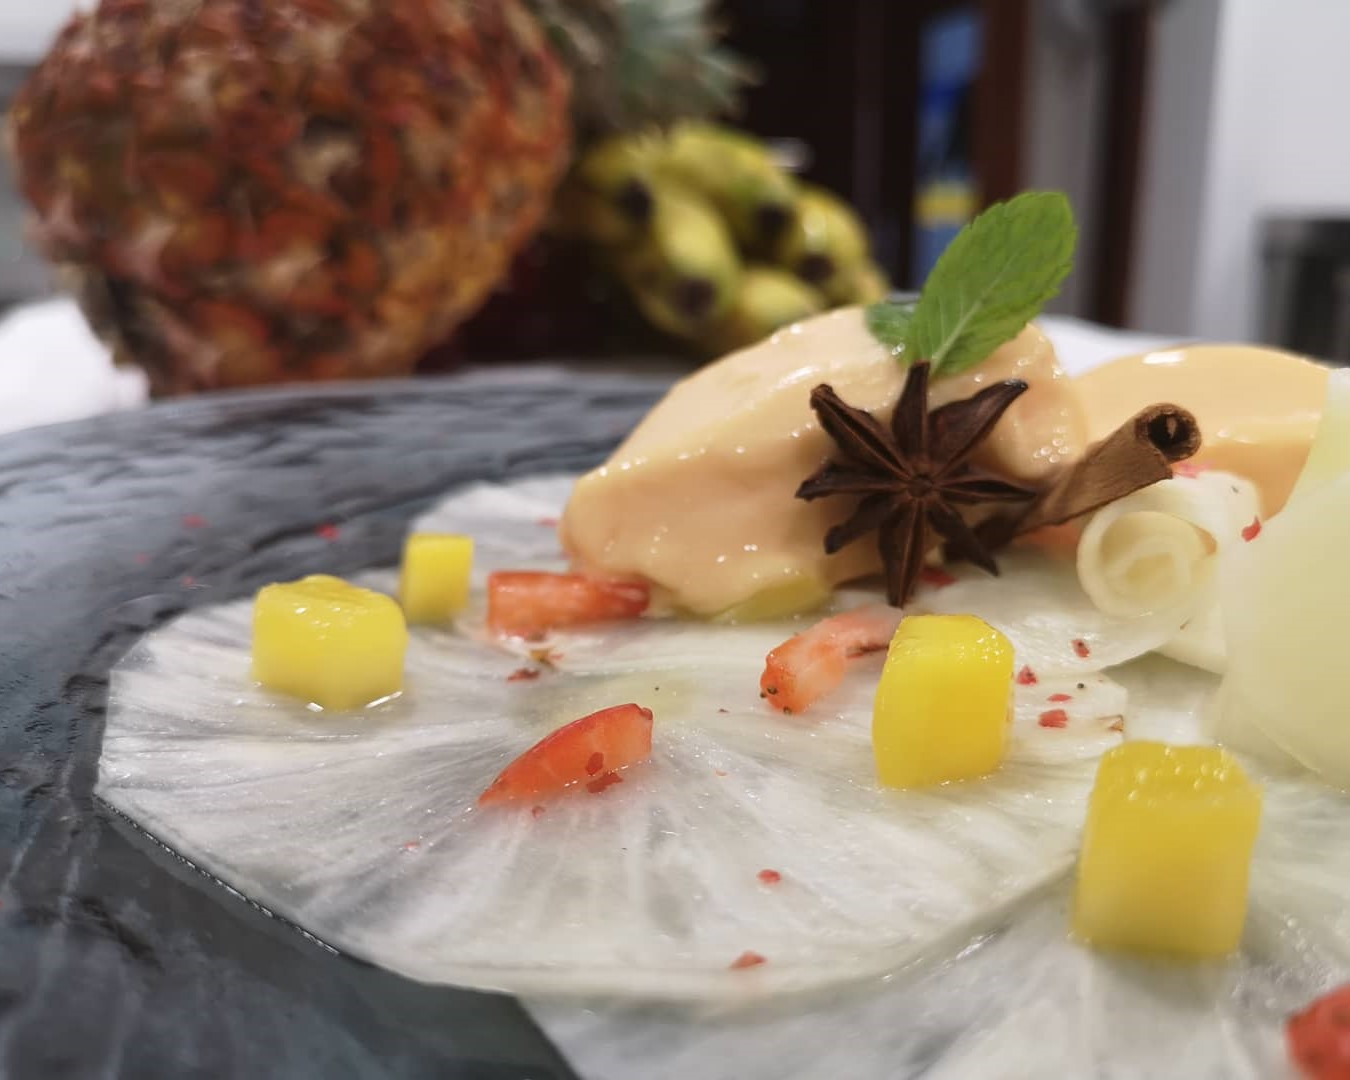 mesa-habla-postre-carpacio-piña-helado-artesanal-papaya-jardin-tecina